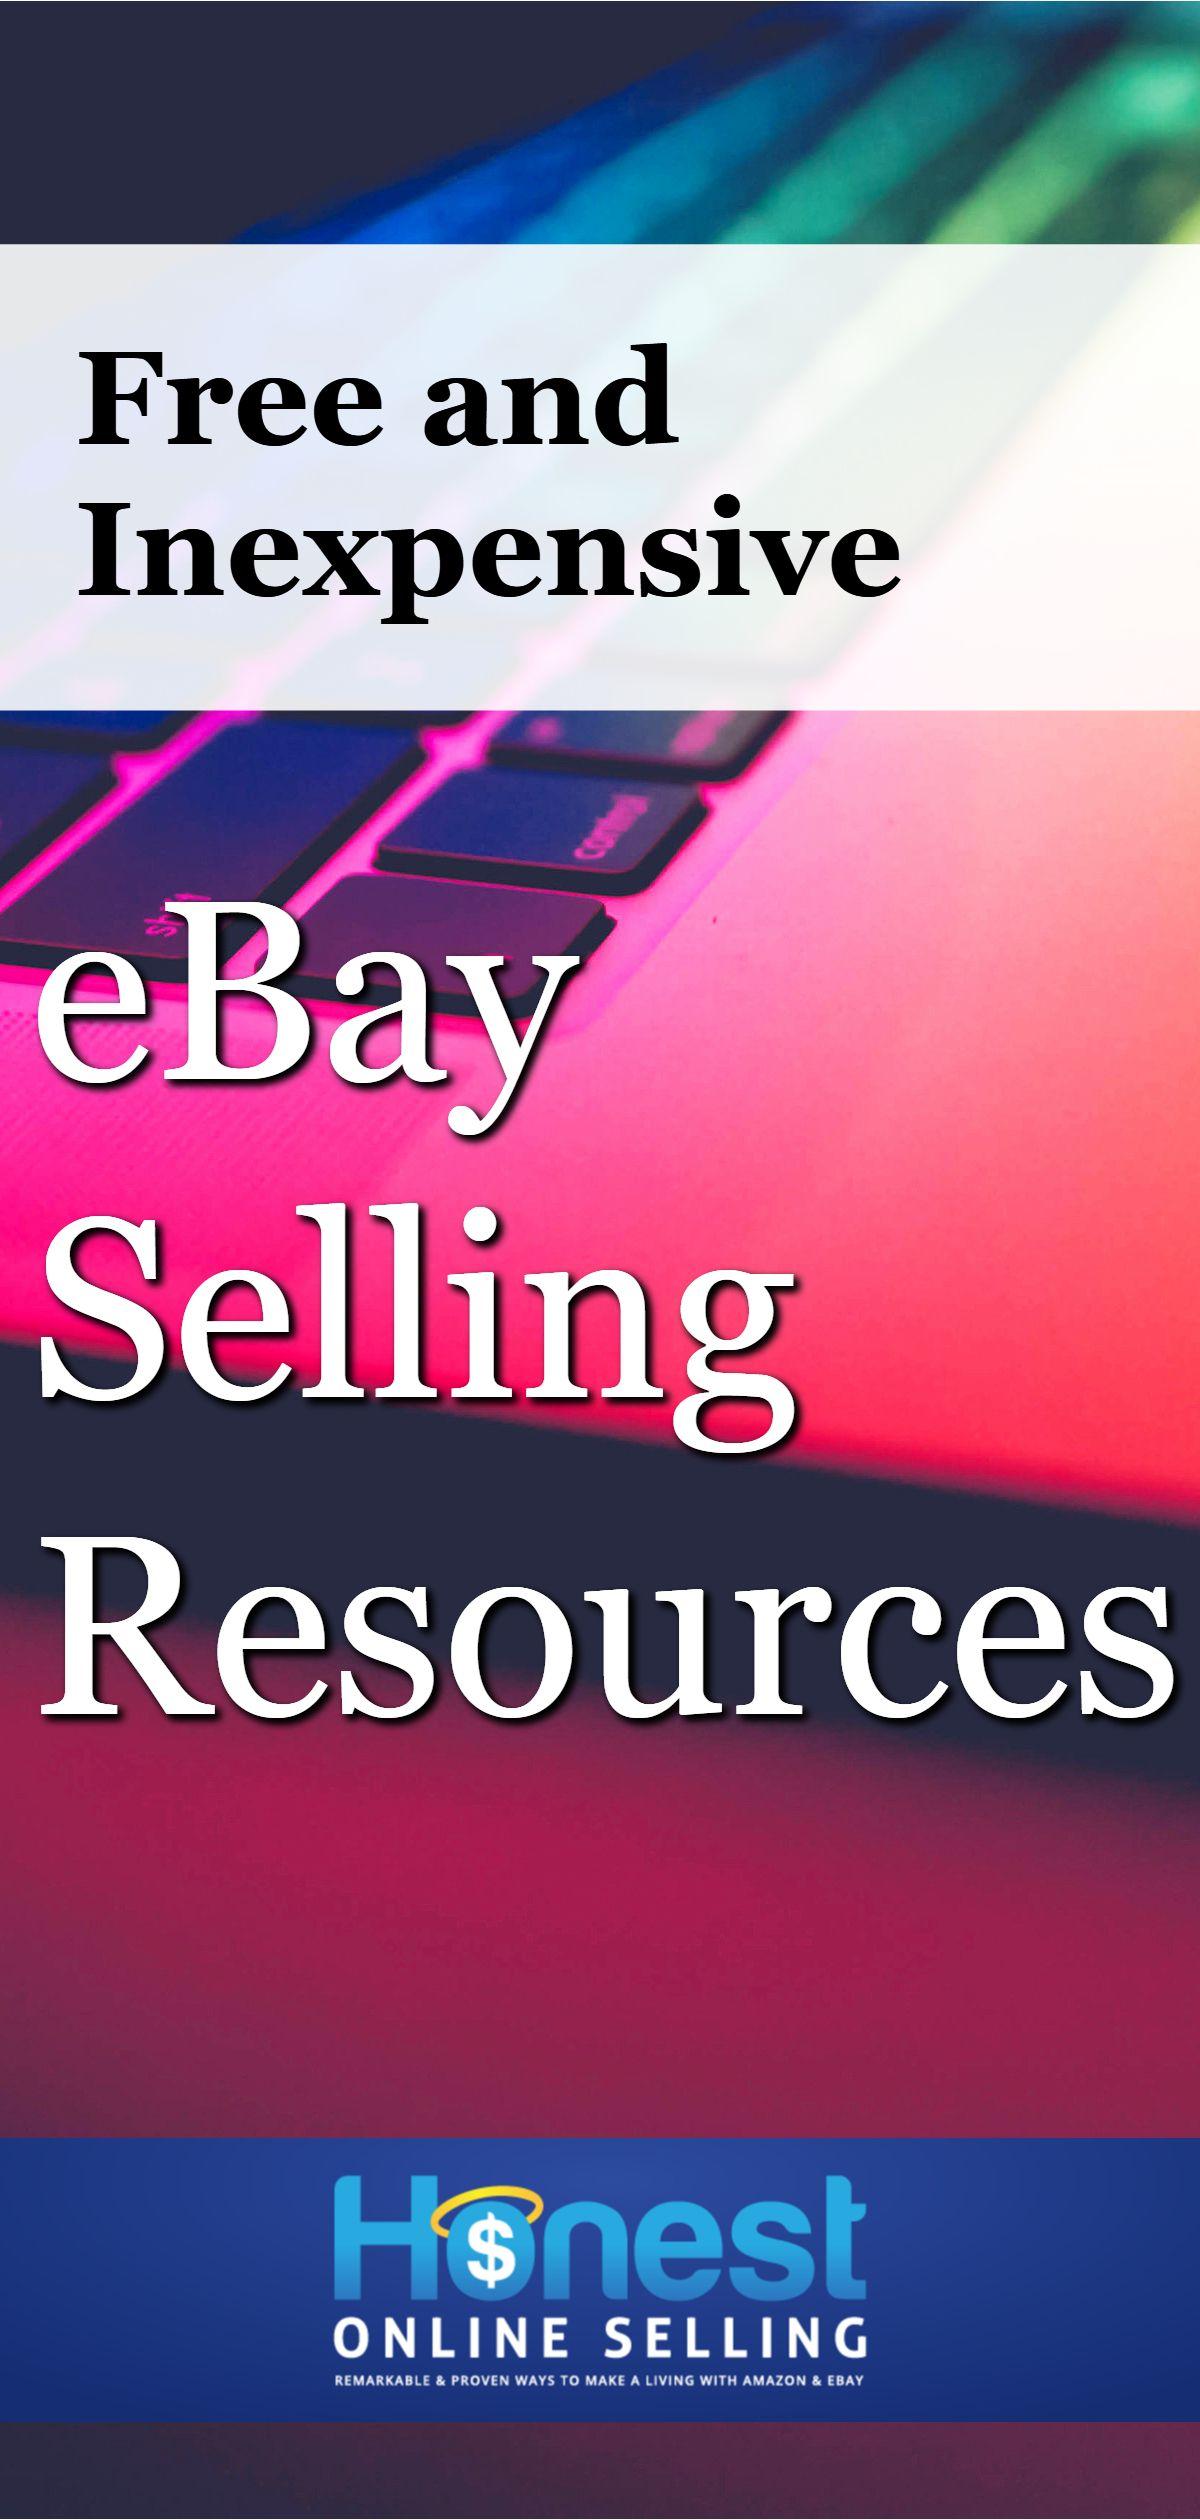 Amazon Seller Help Ebay Seller Resources Ebay Selling Tips Make Money On Amazon Selling On Ebay